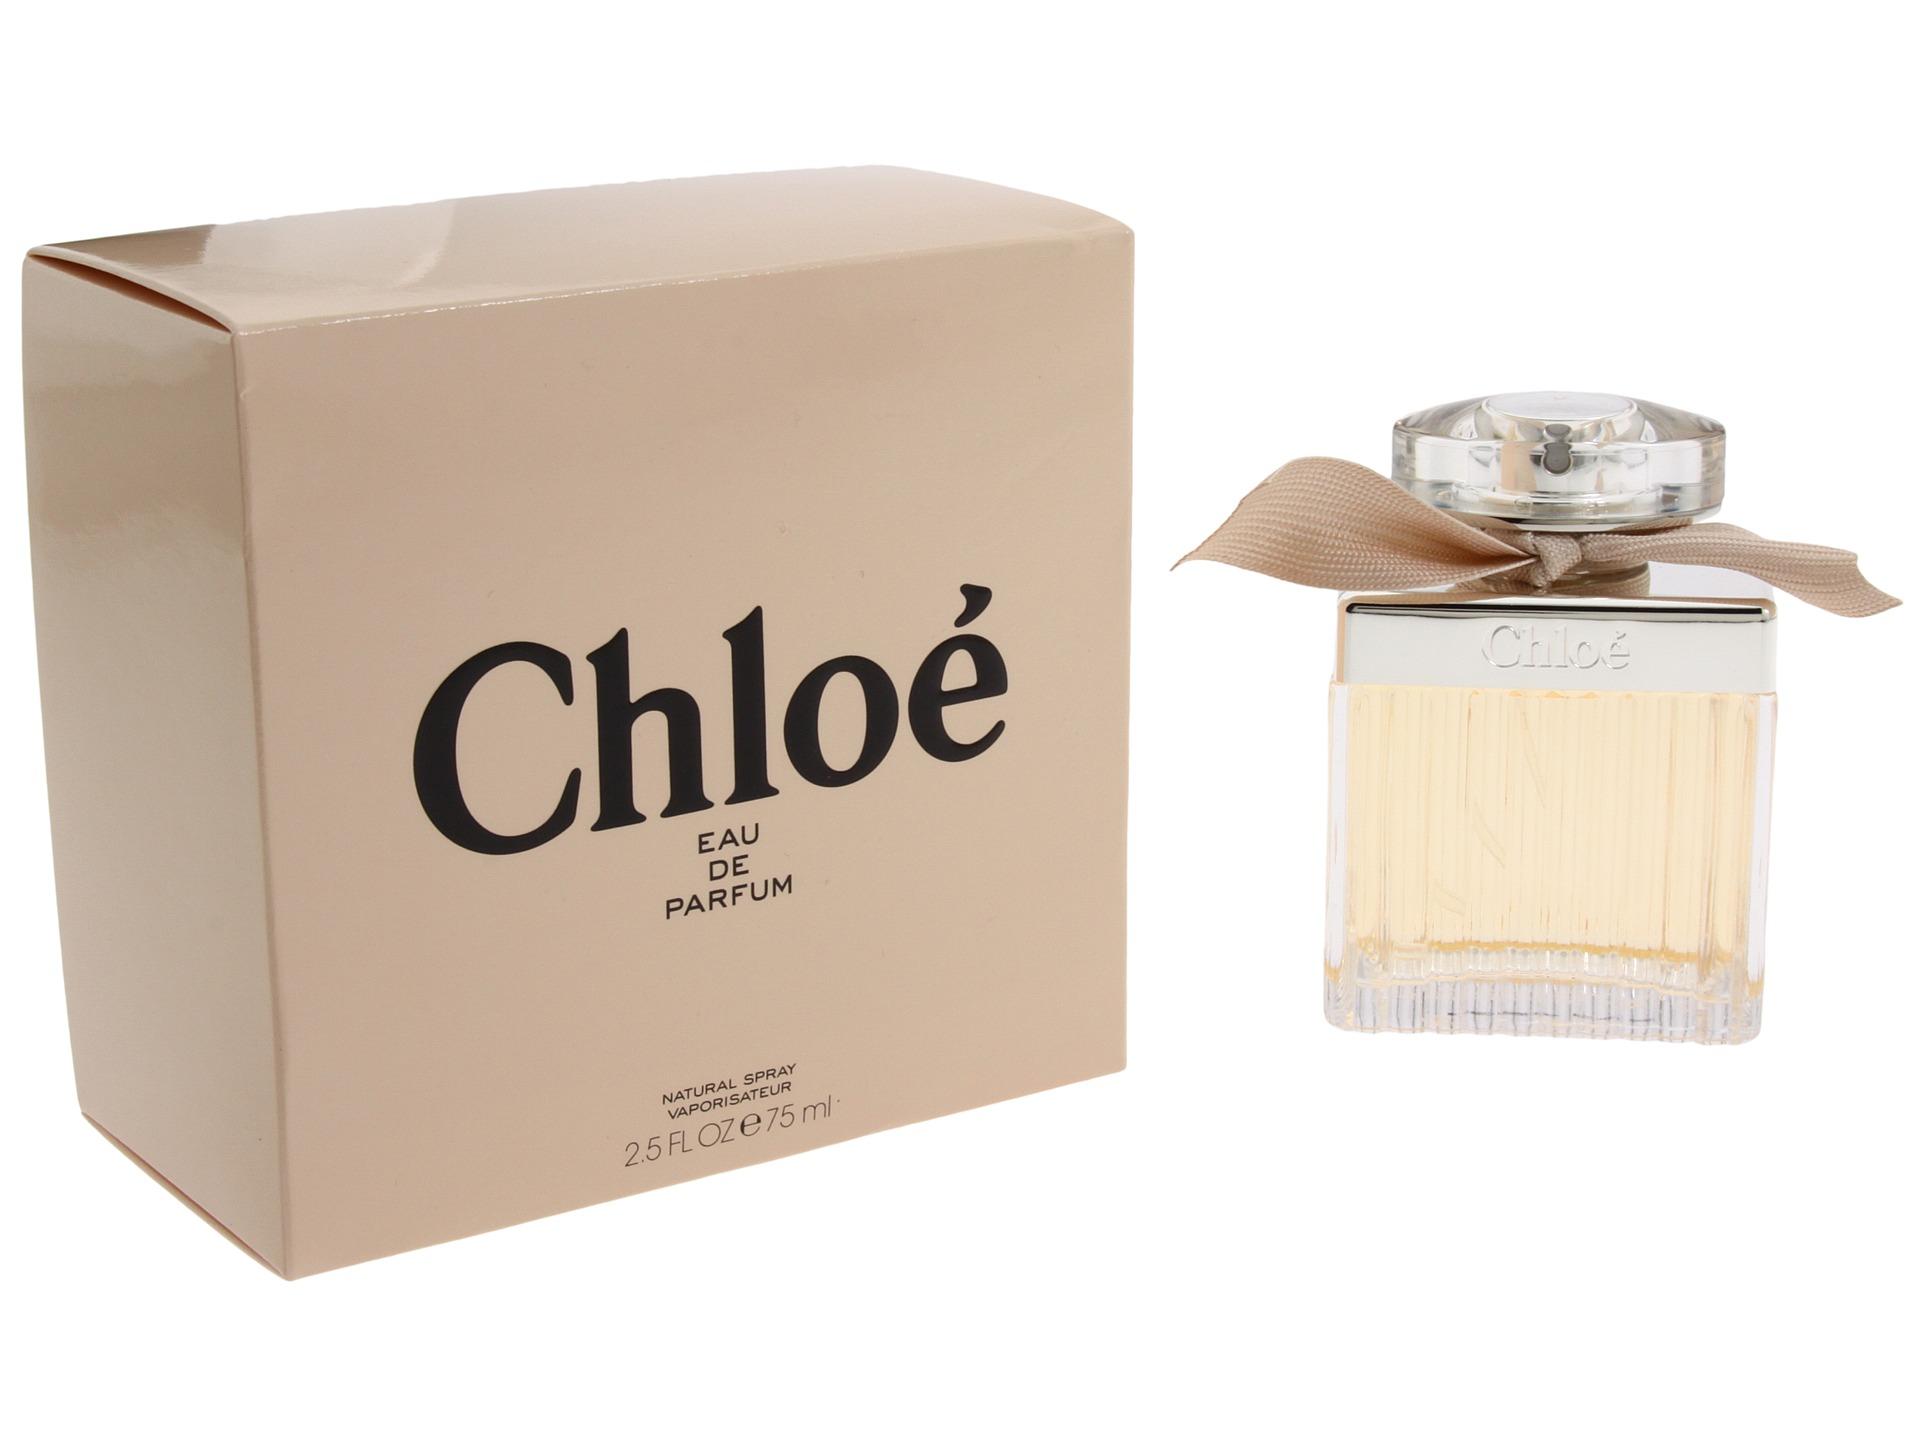 chloe chloe eau de parfum spray 2 5 oz shipped free at